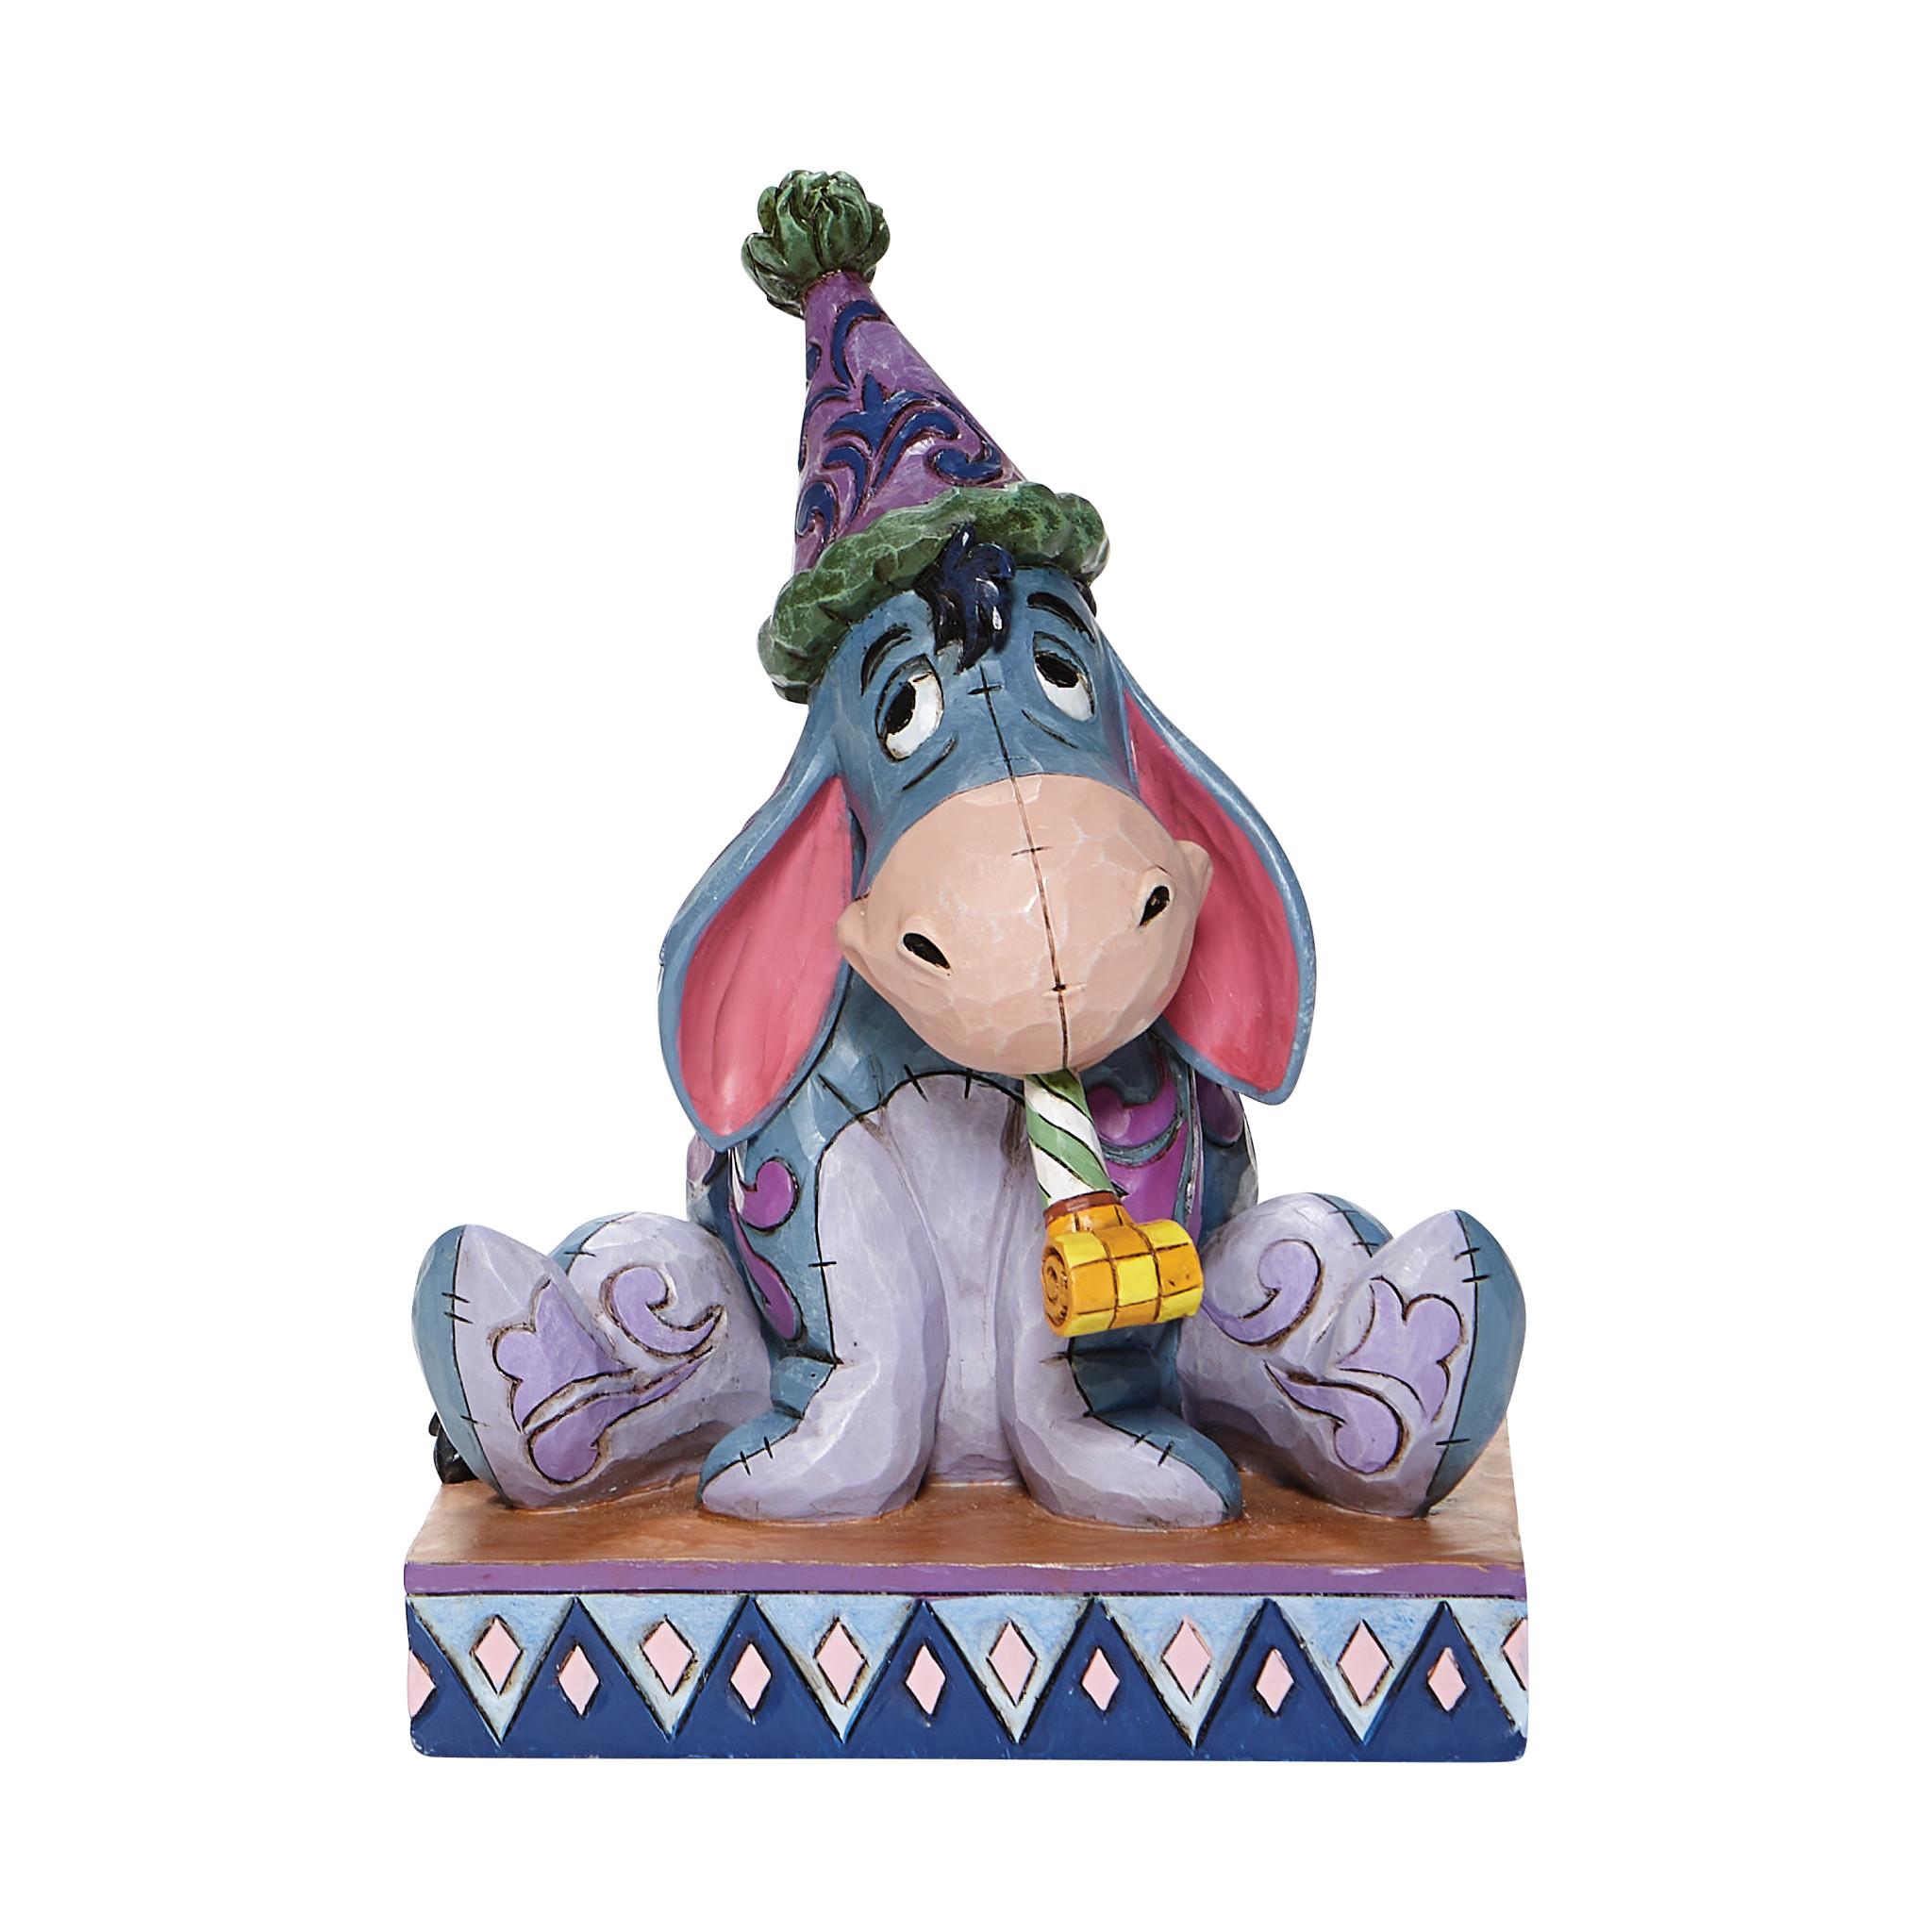 Jim Shore - General 'Birthday Blues (Eeyore Birthday Figurine) 20cm' 2021